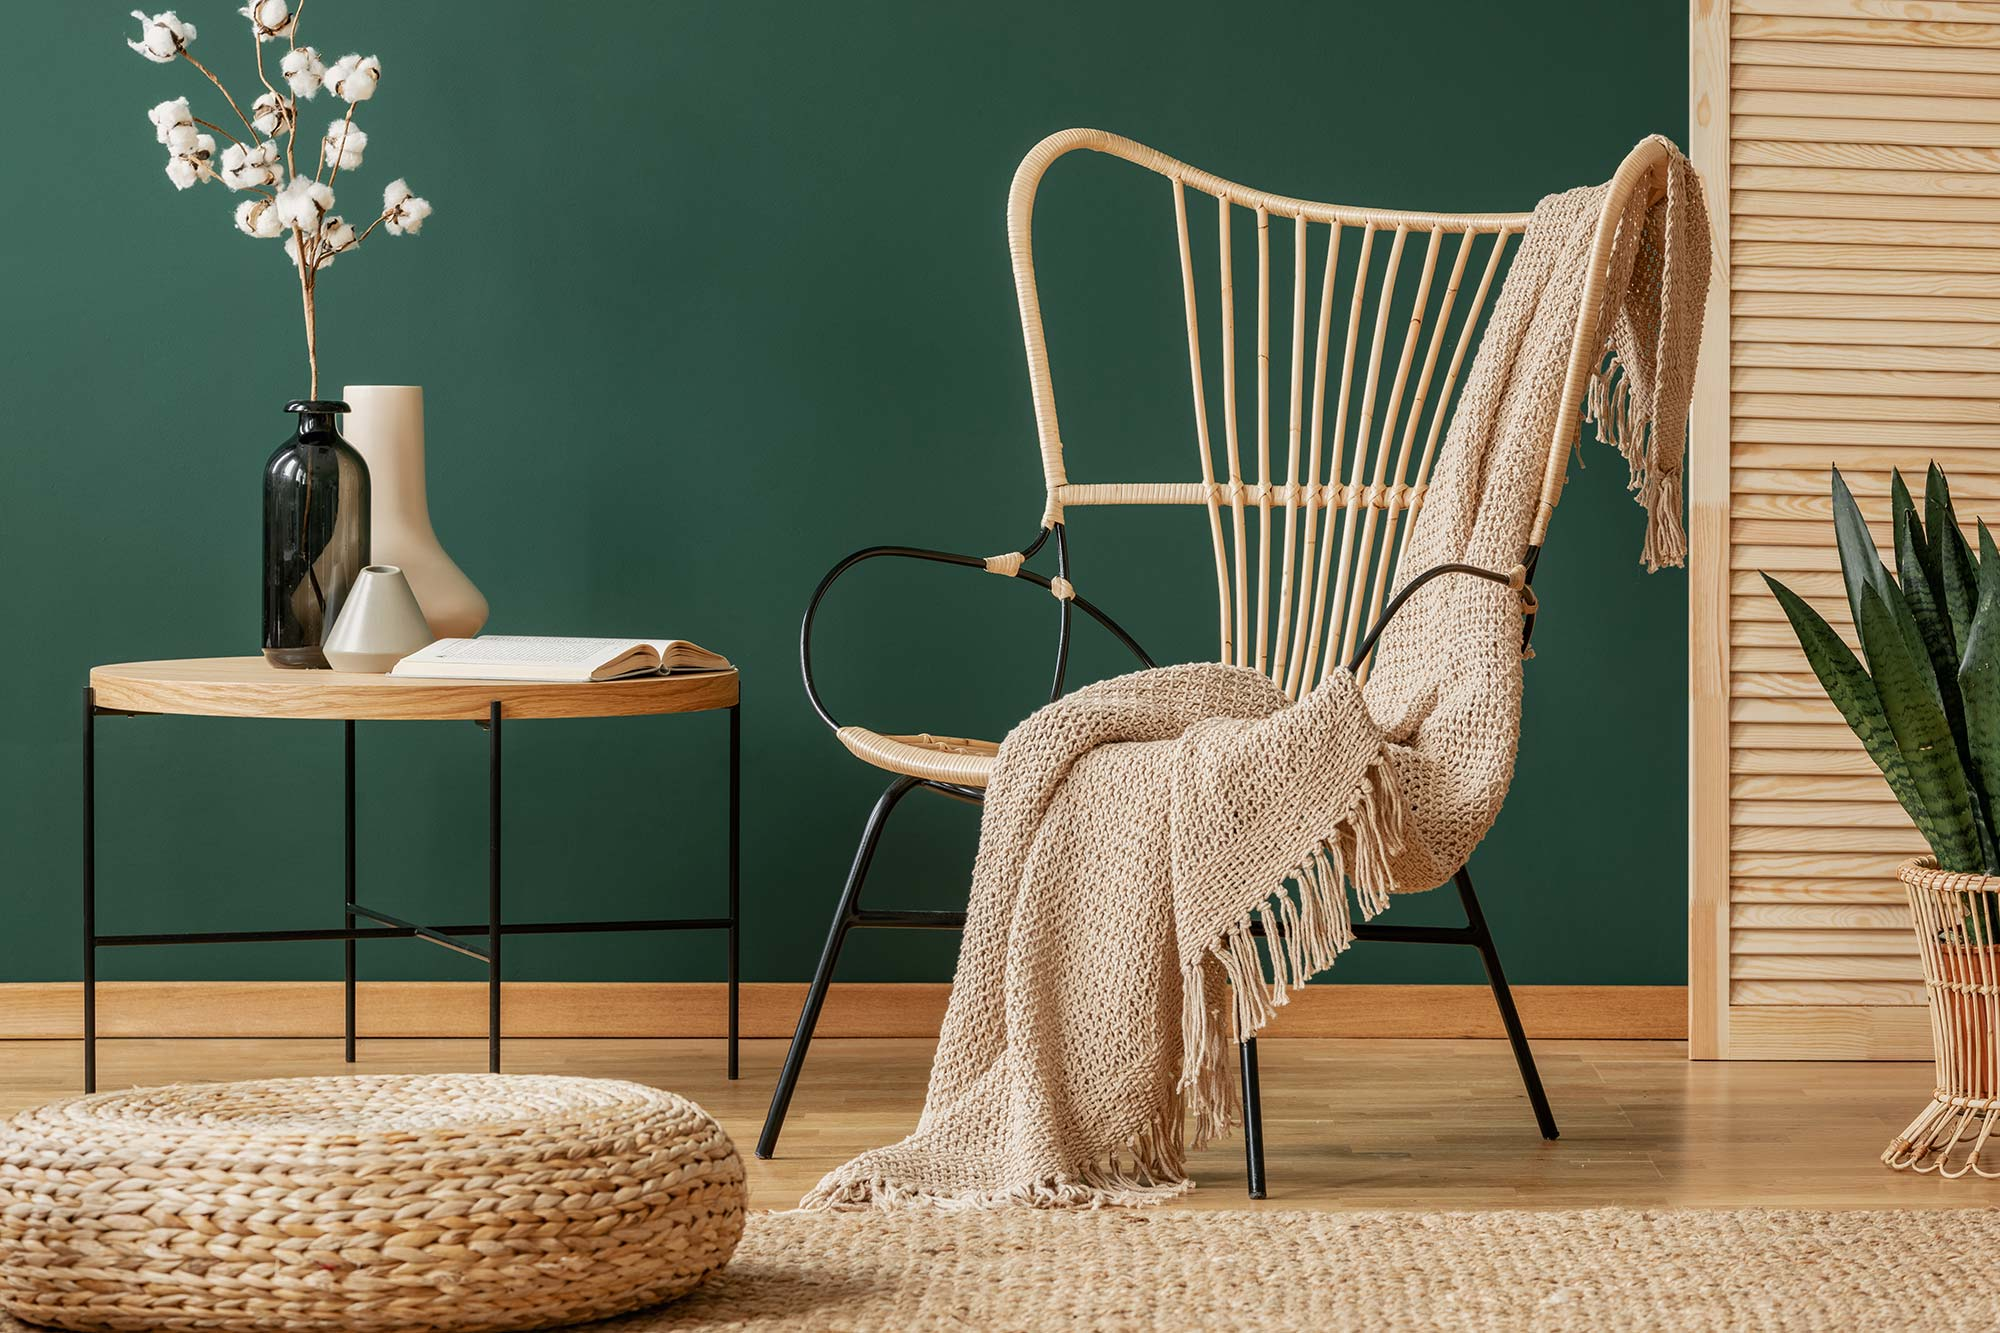 wicker and rattan furniture